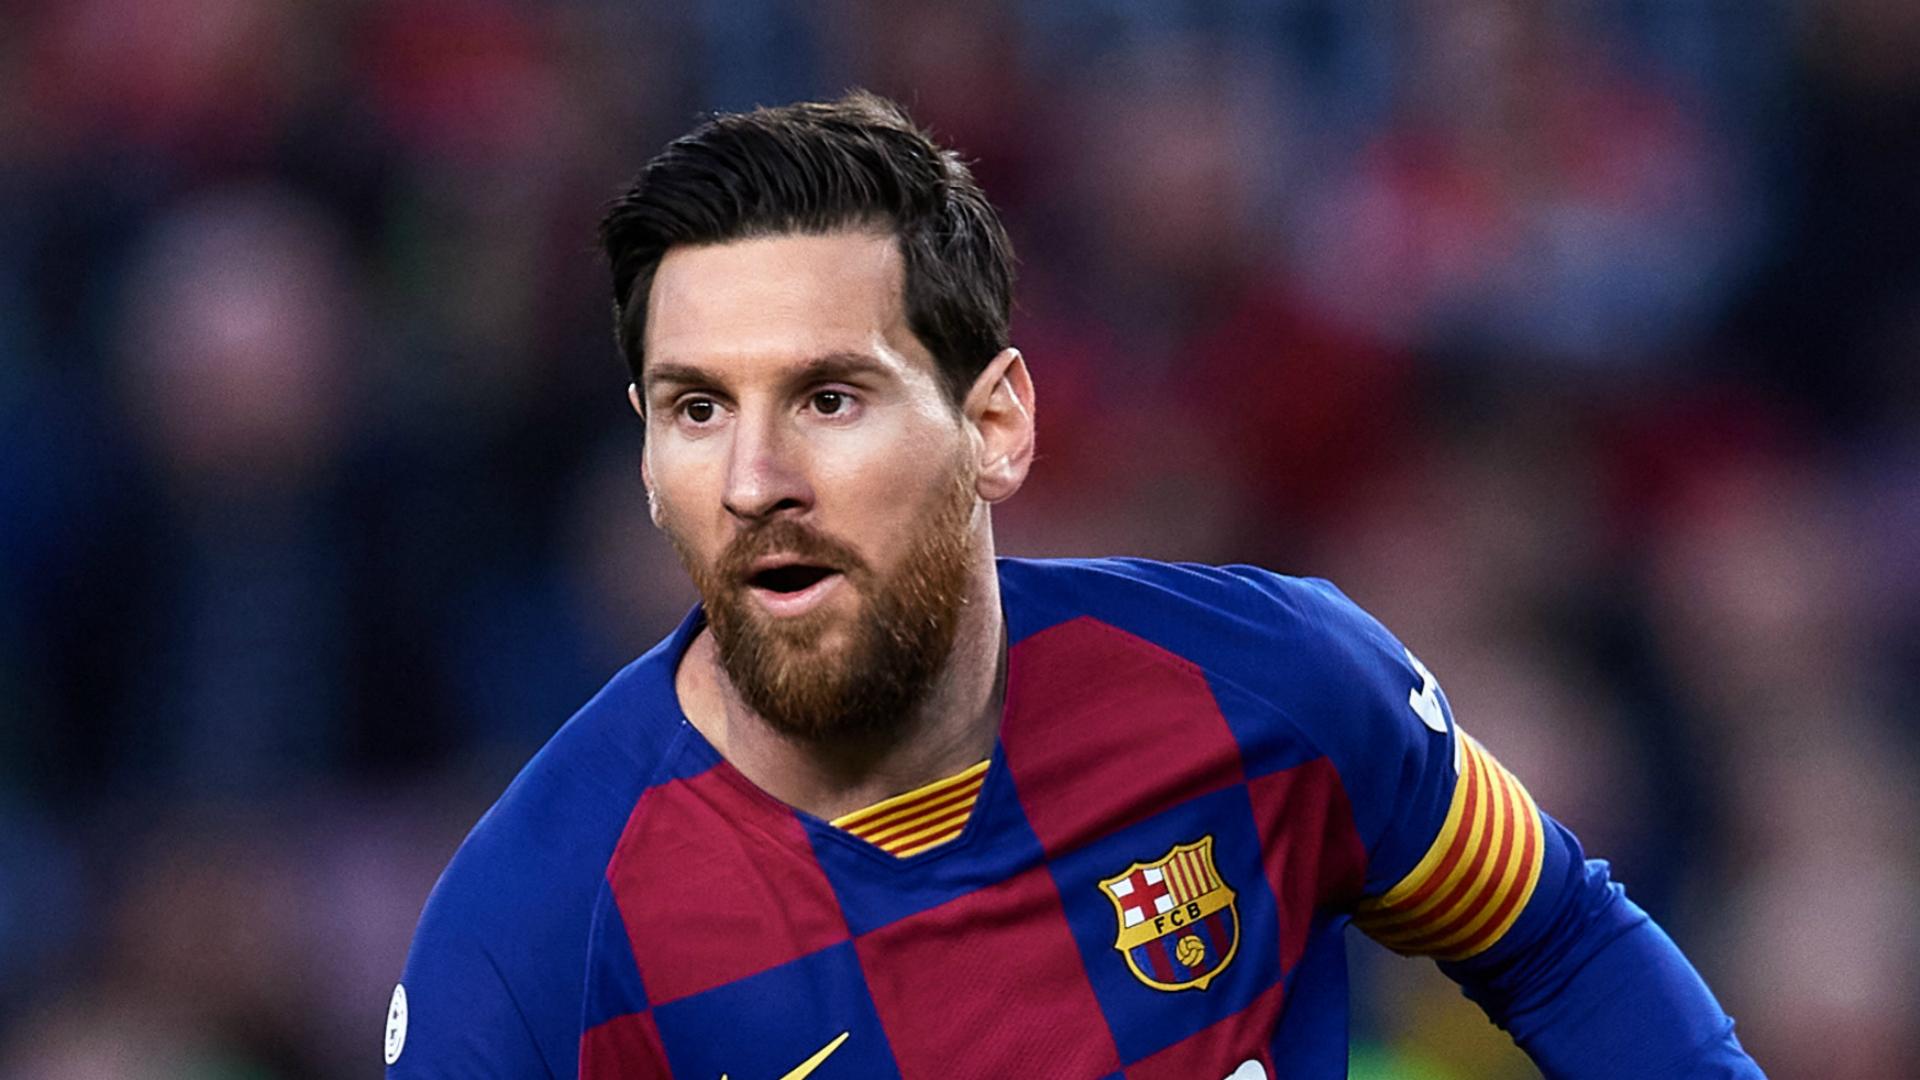 Coronavirus: Health must always come first, says Messi